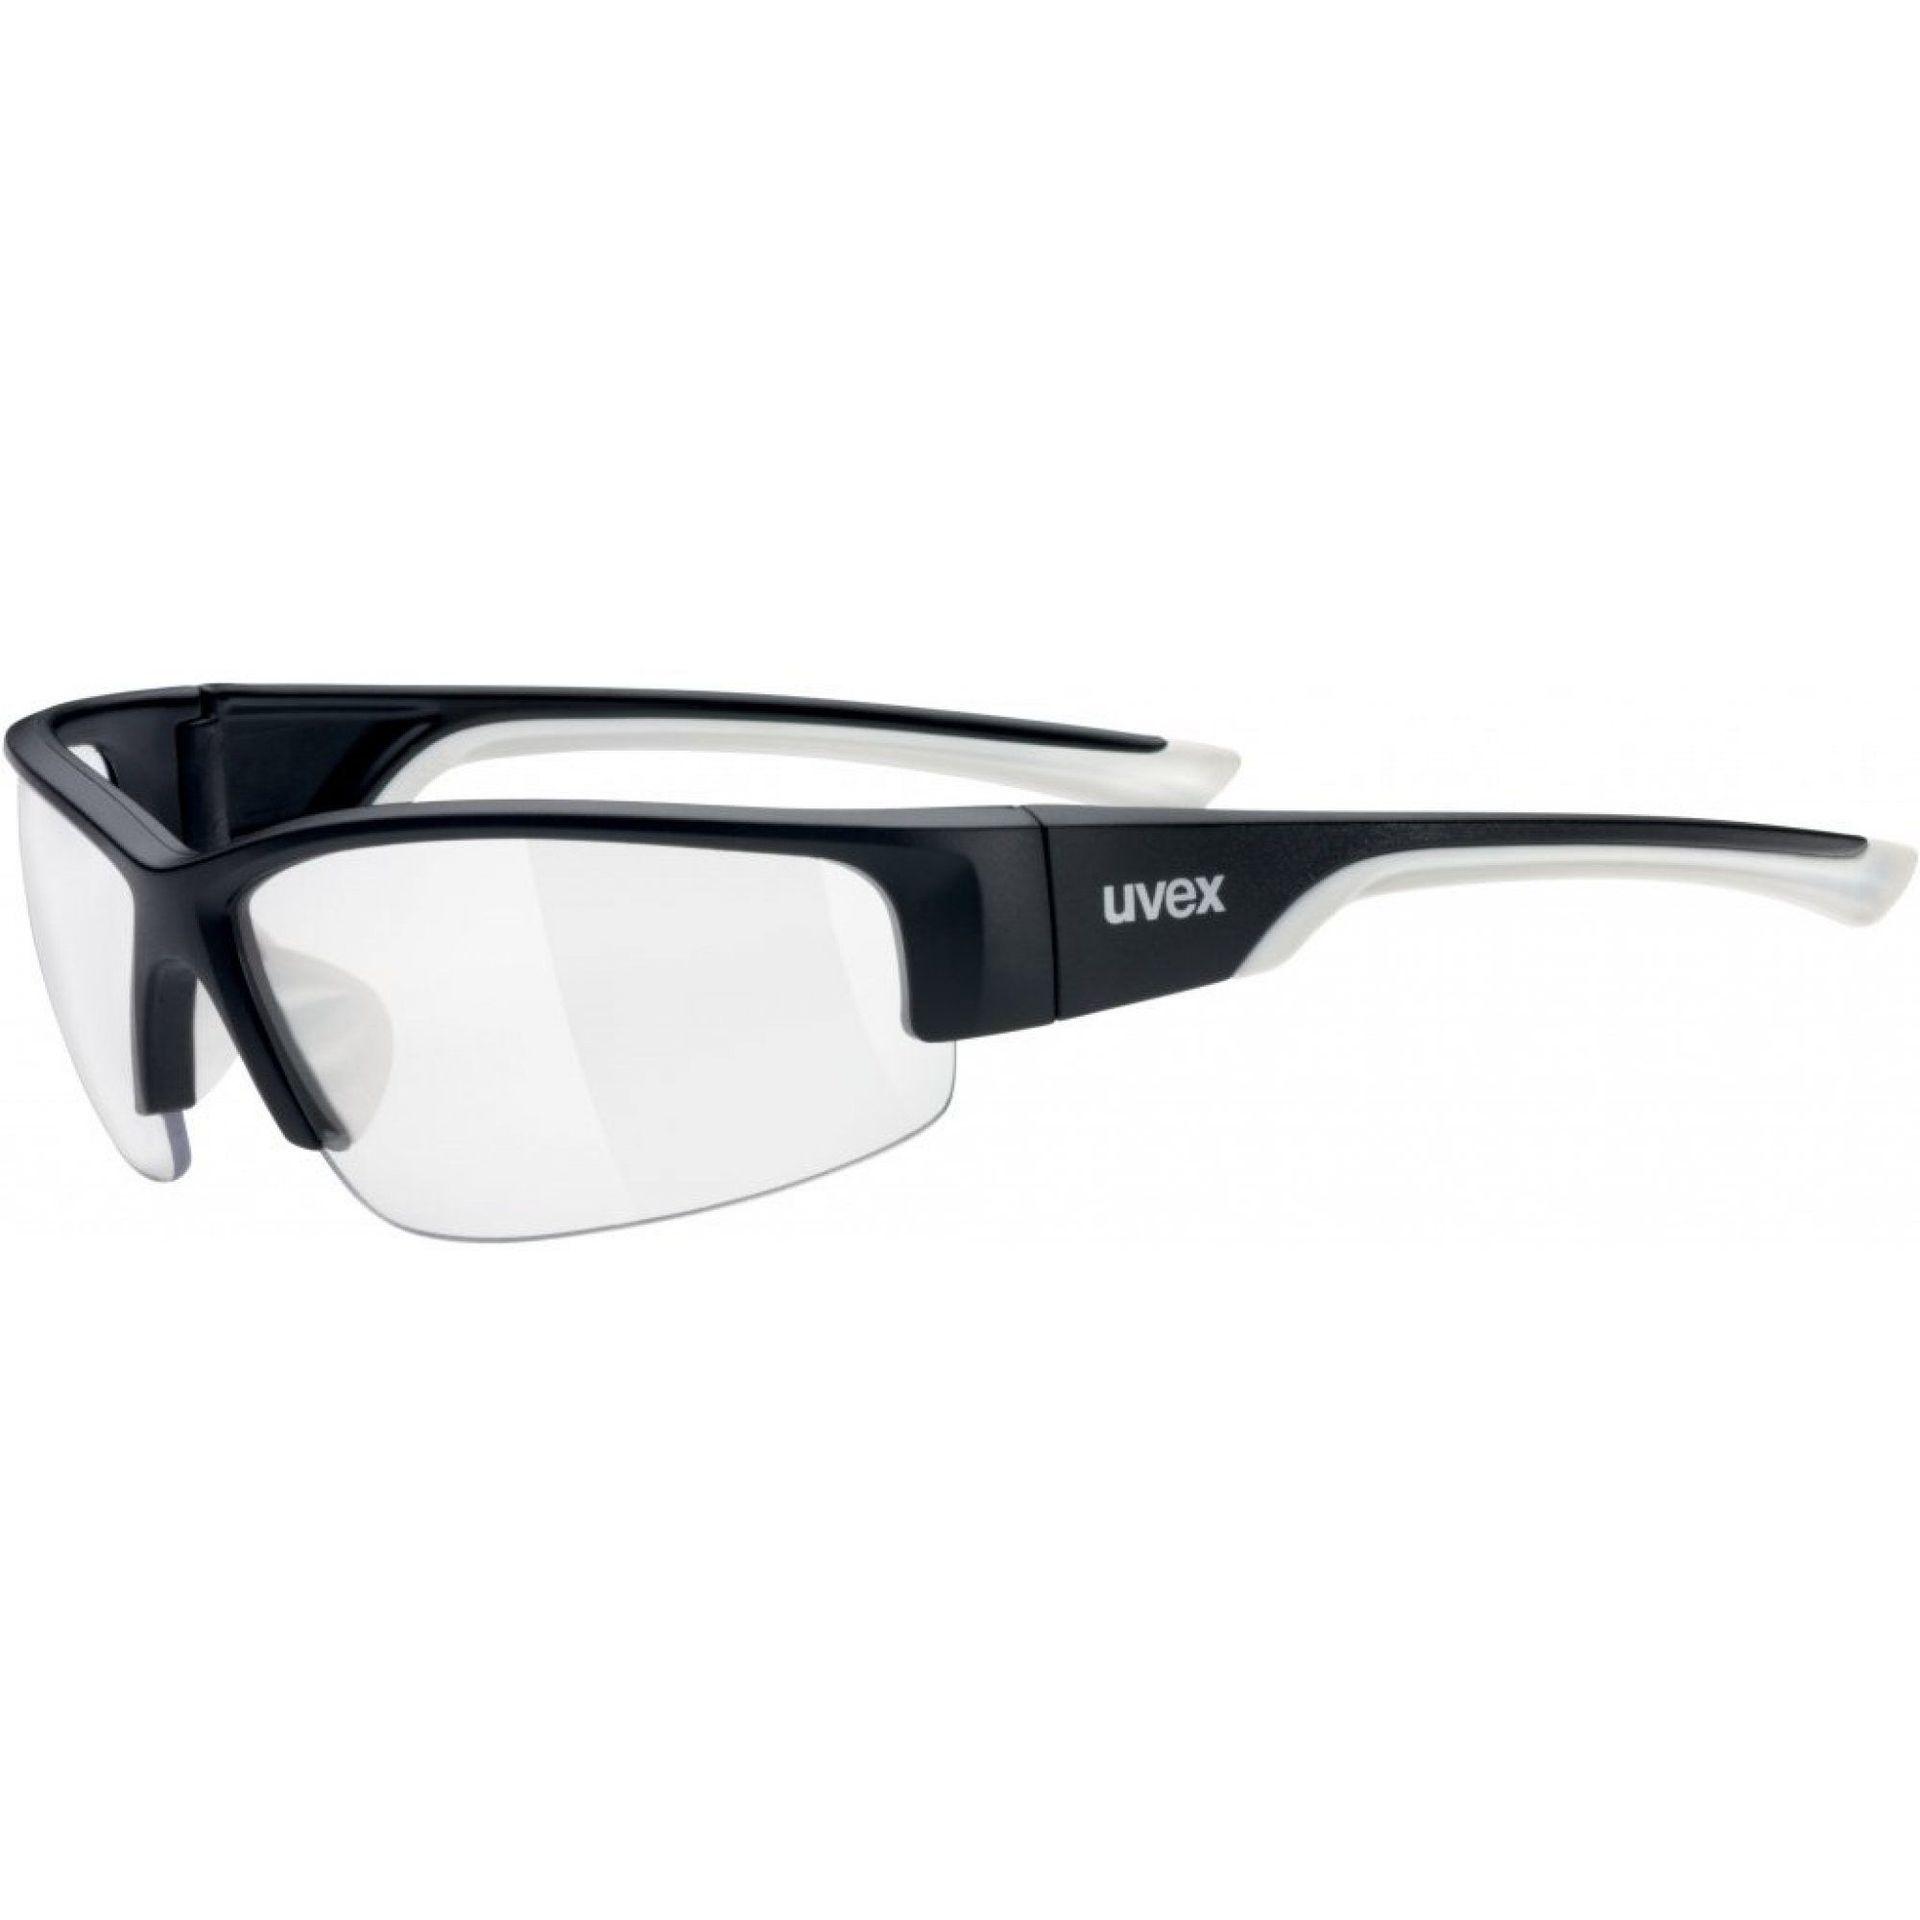 OKULARY UVEX SPORTSTYLE 215 BLACK MAT WHITE